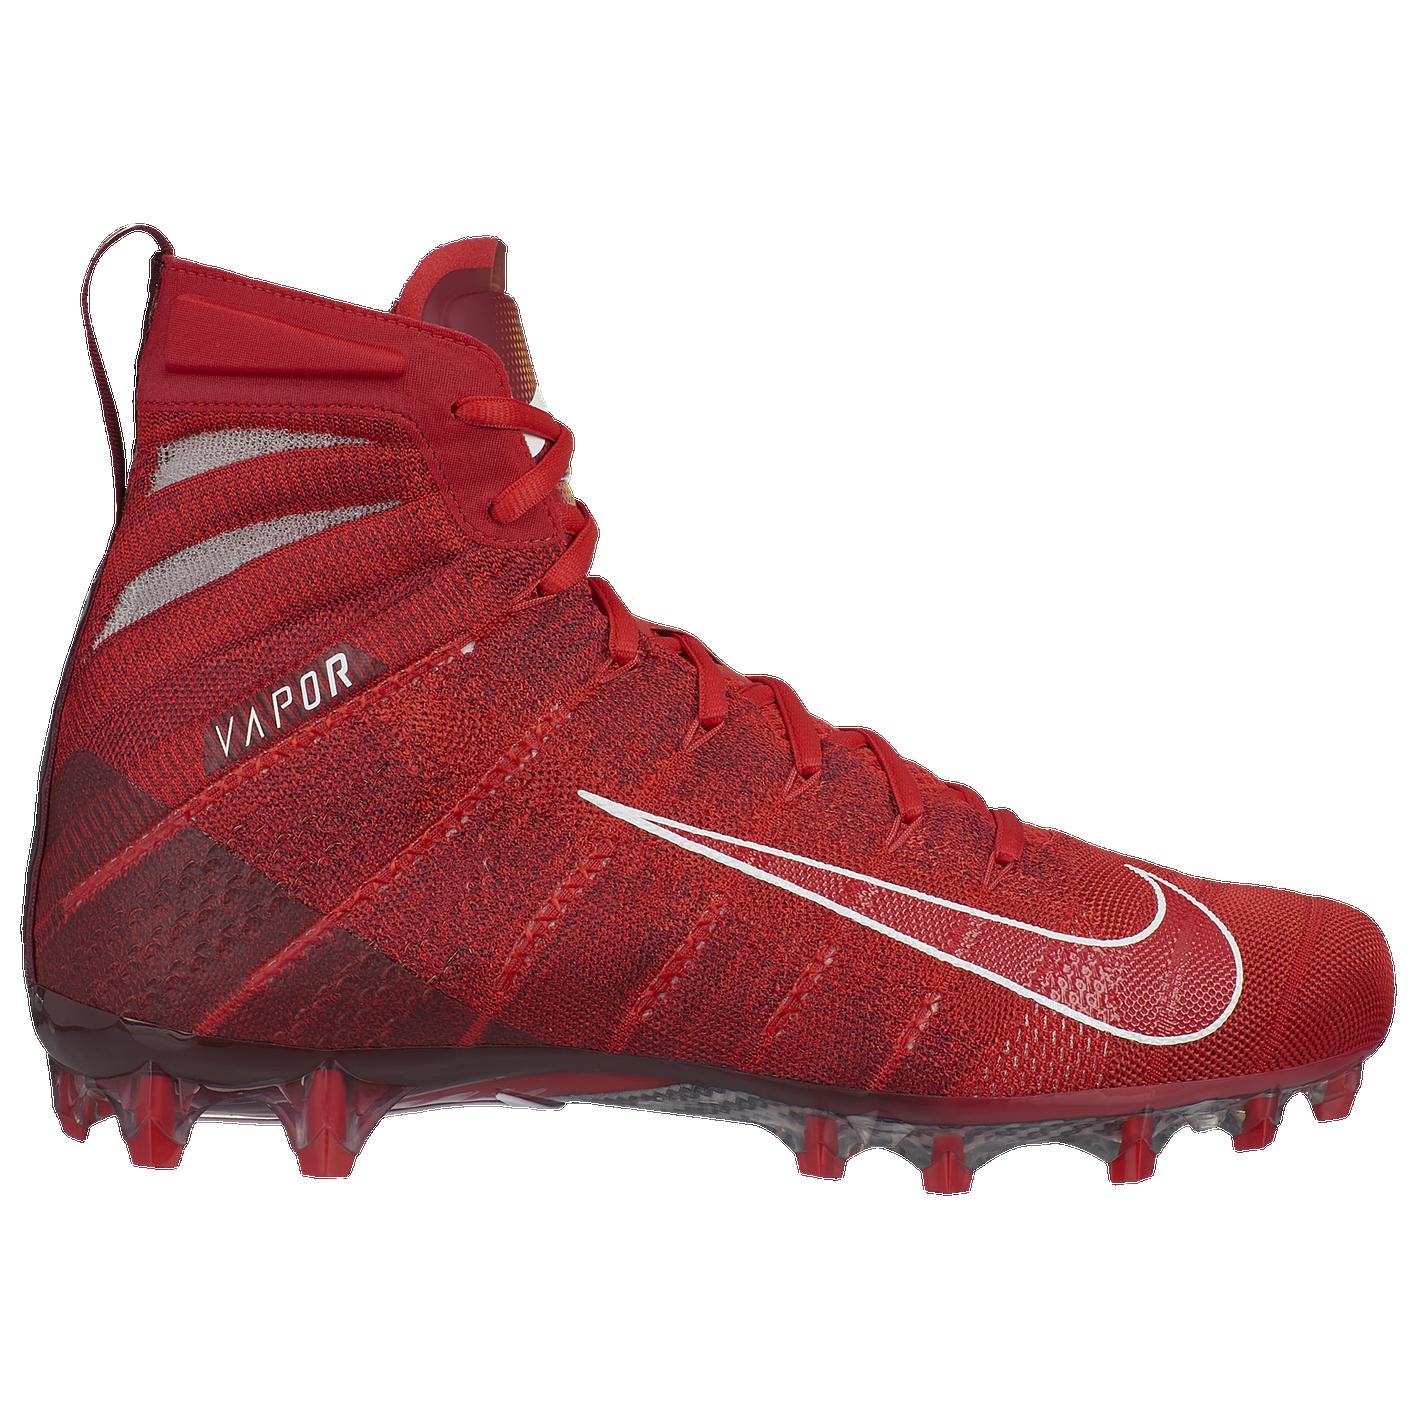 promo code f2762 200ca Nike Vapor Untouchable 3 Elite - Men s